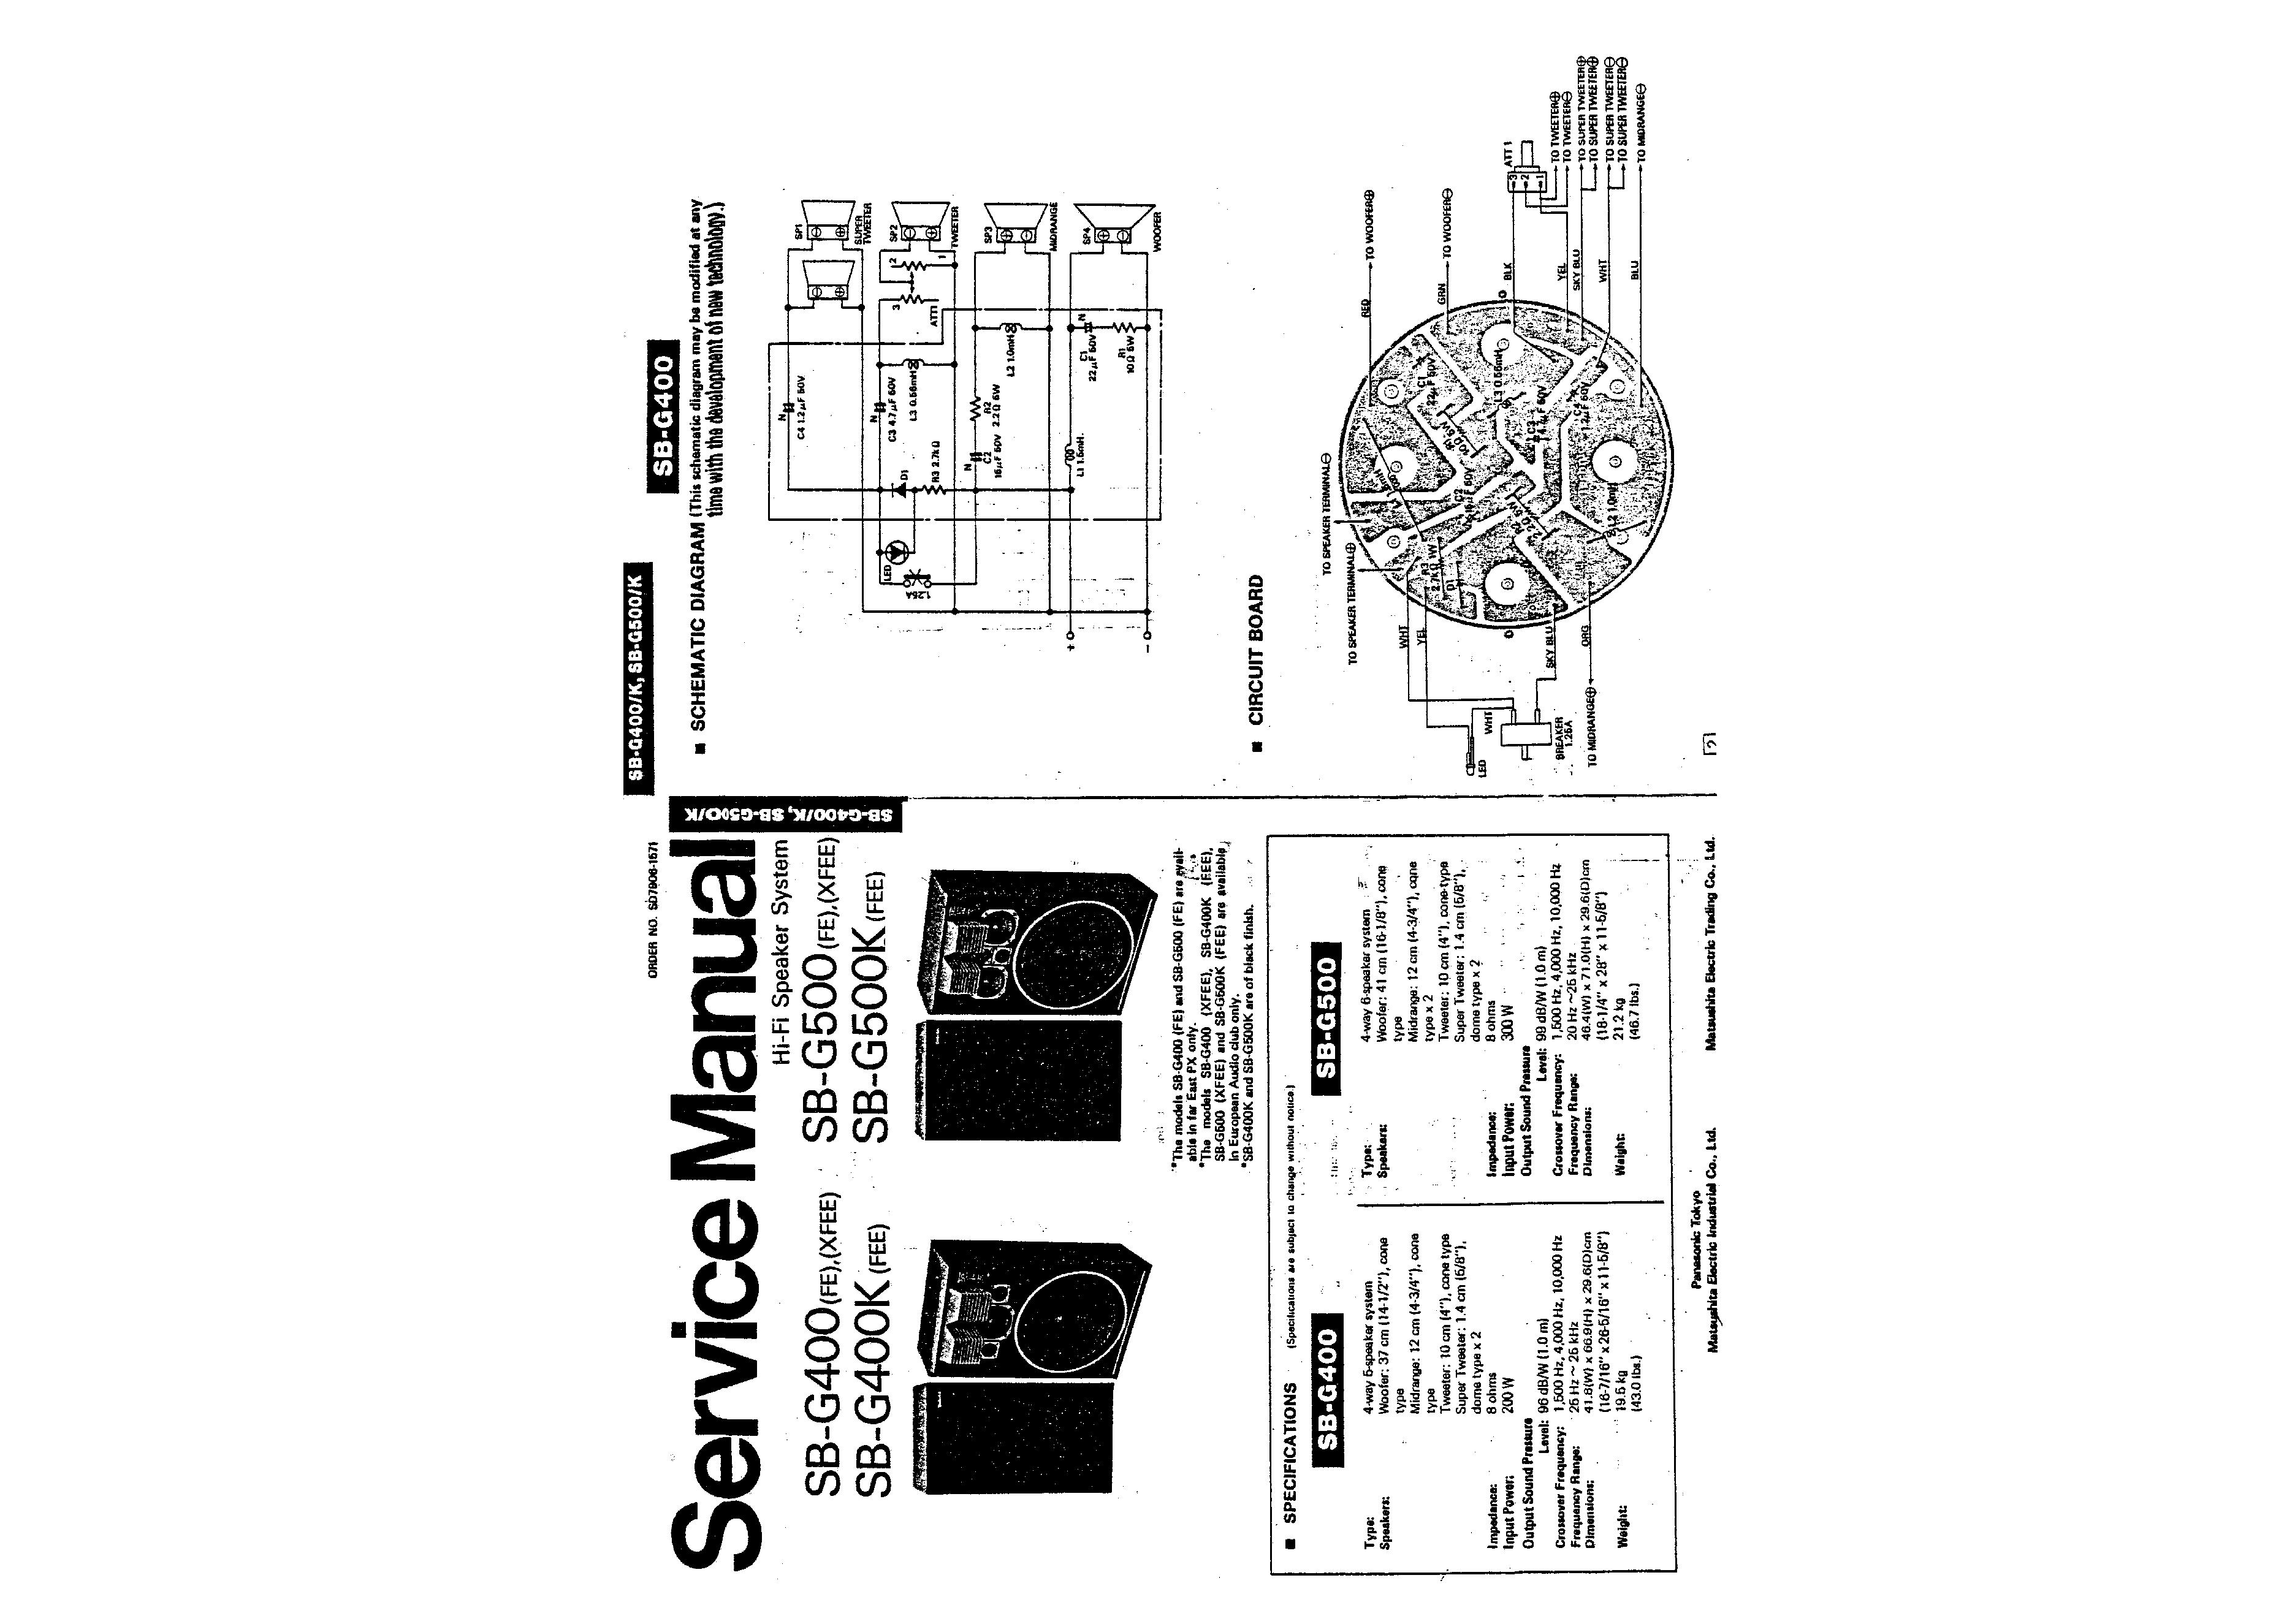 Service Manual For Technics Sb-g400